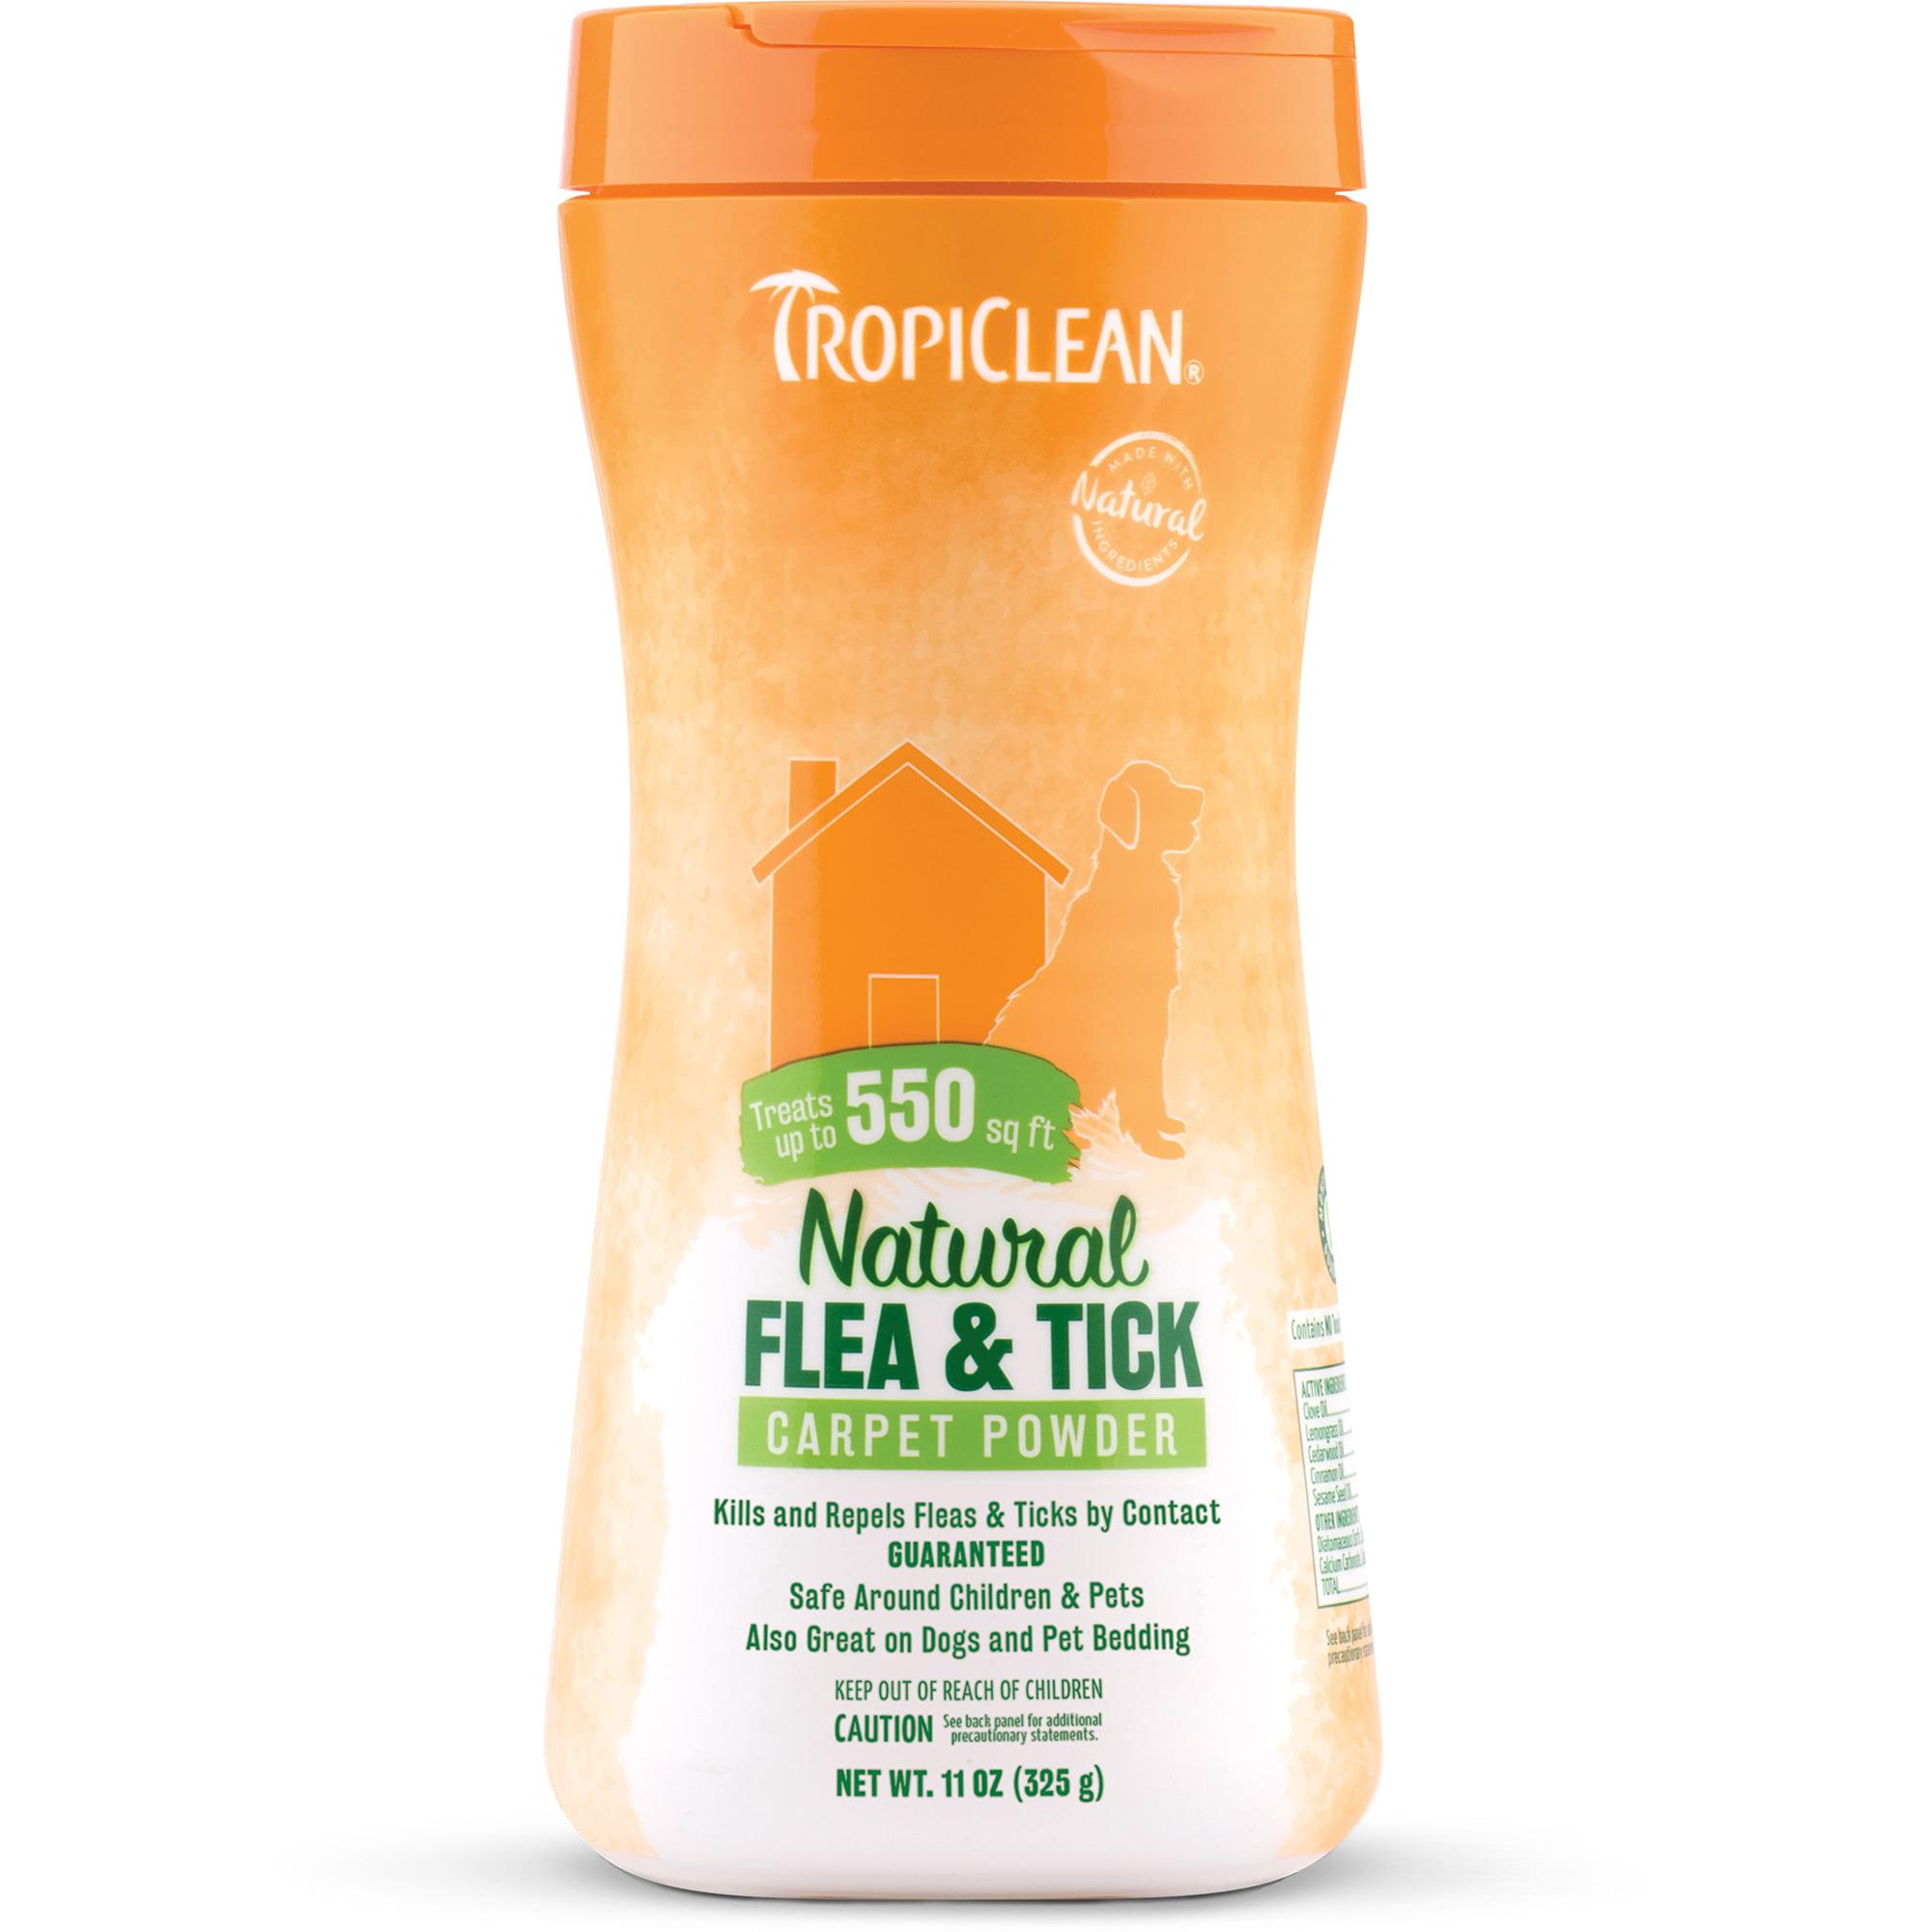 TropiClean Natural Flea & Tick Carpet Powder, 11 Oz